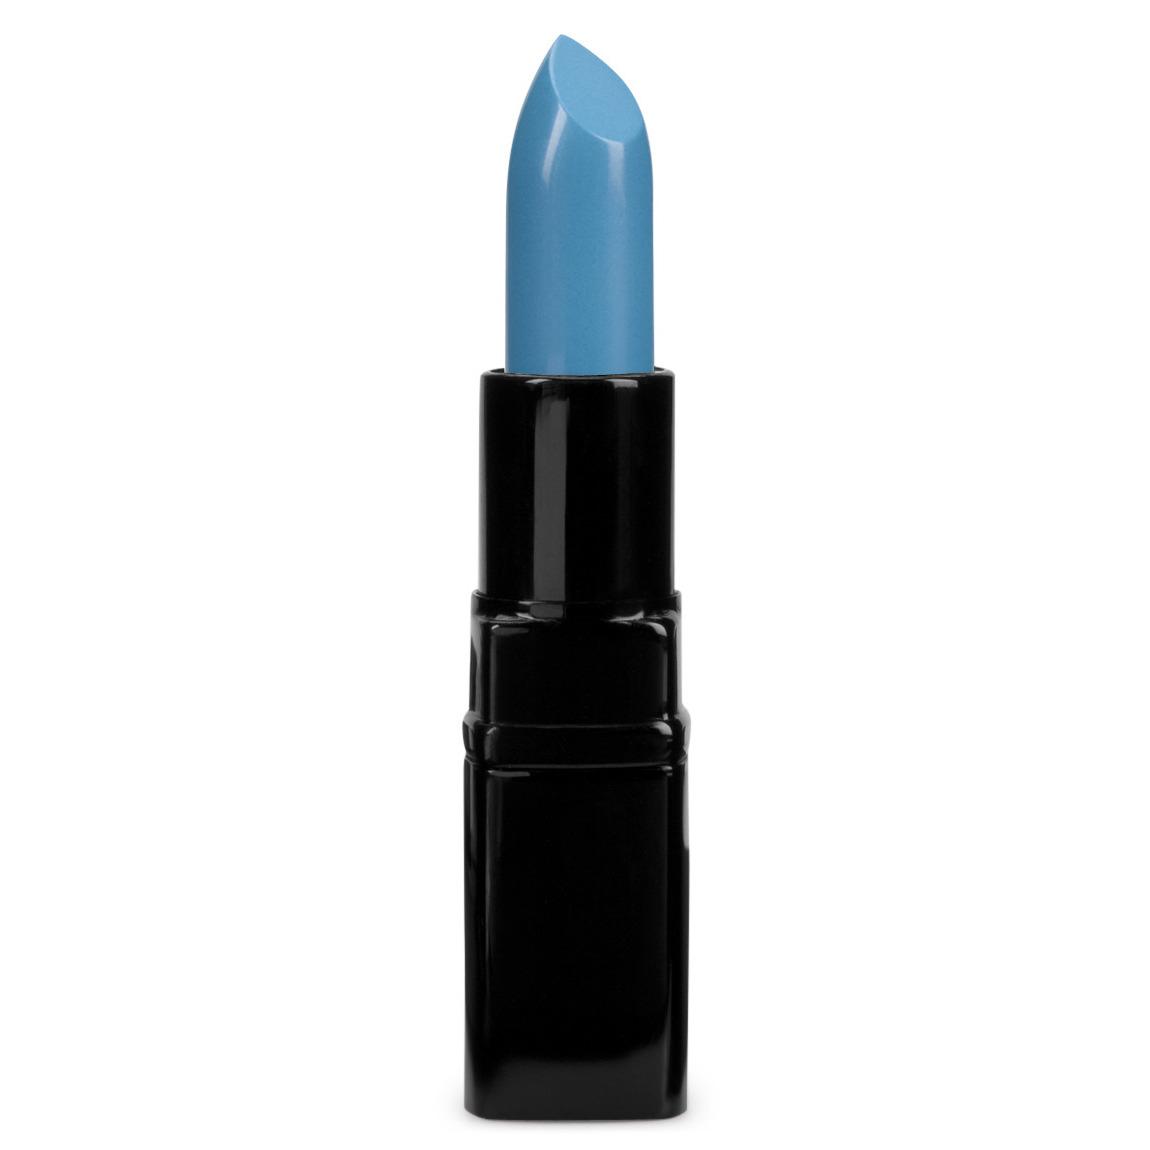 Inglot Cosmetics Lipstick 287 Cream